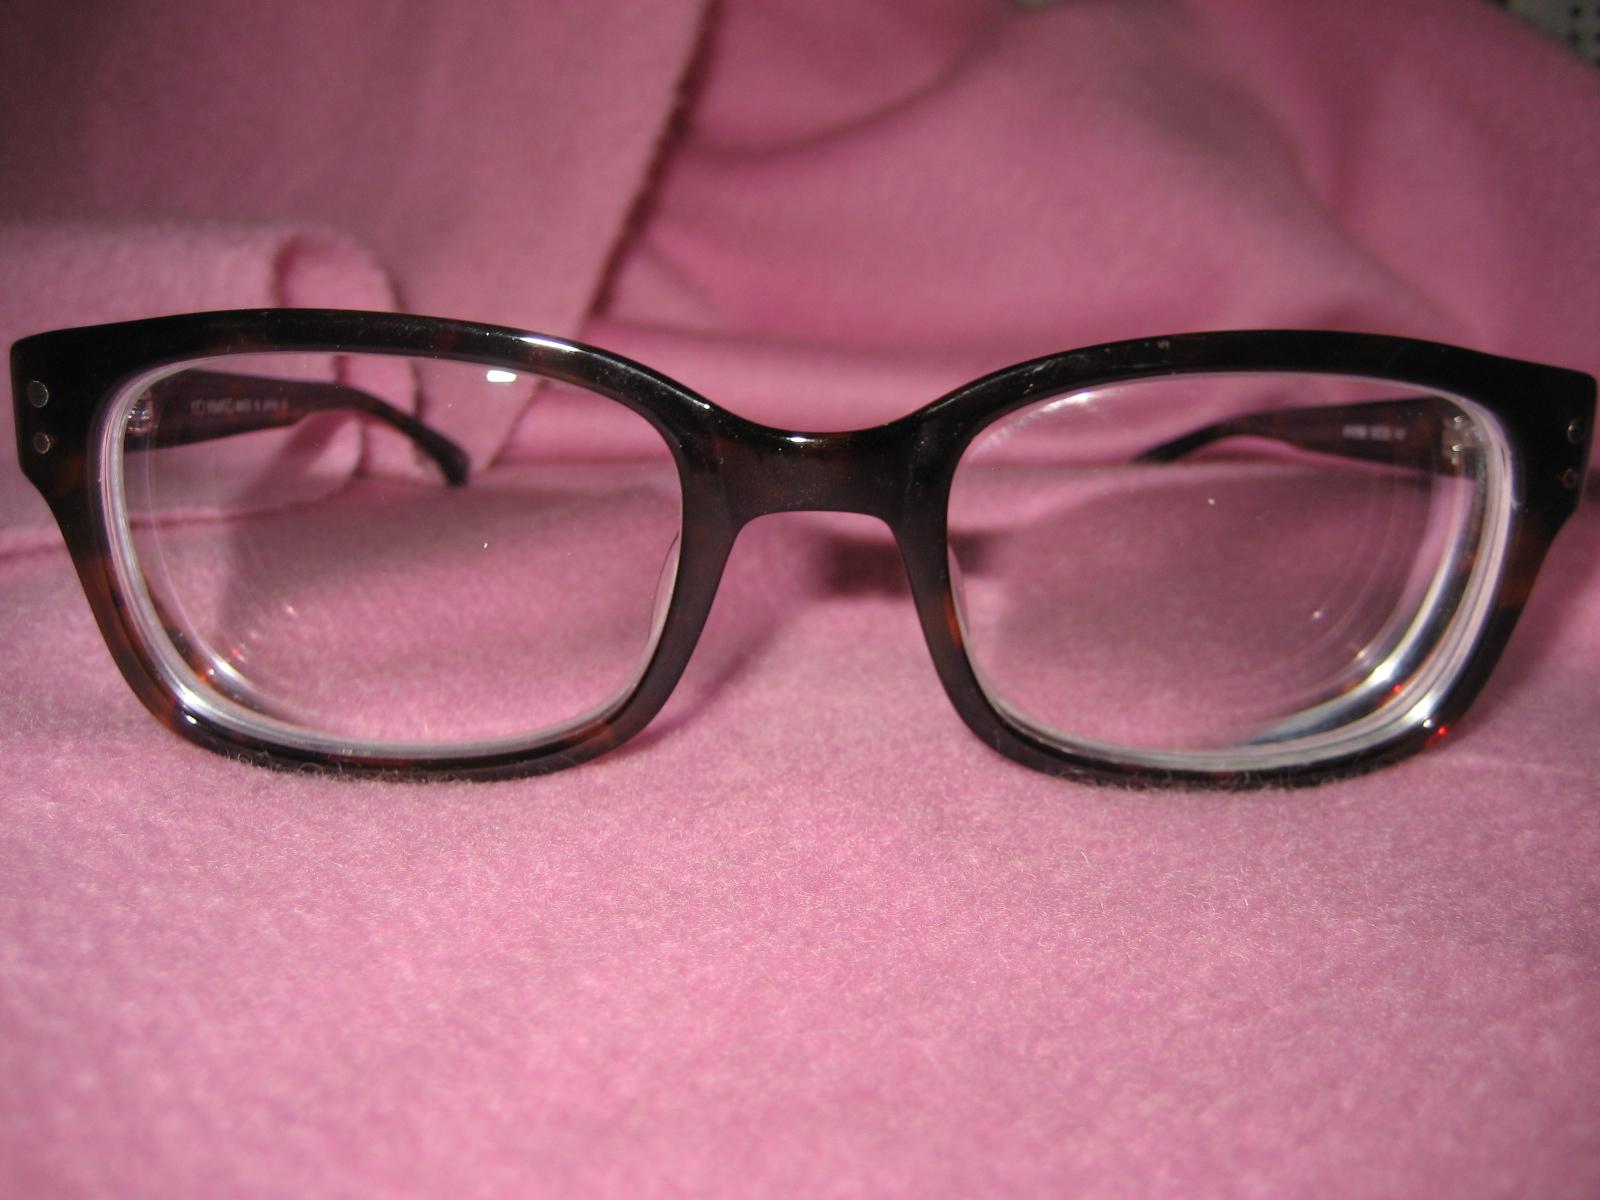 Kio Yamato Eyeglasses Frames : Kio Yamato Eyeglasses